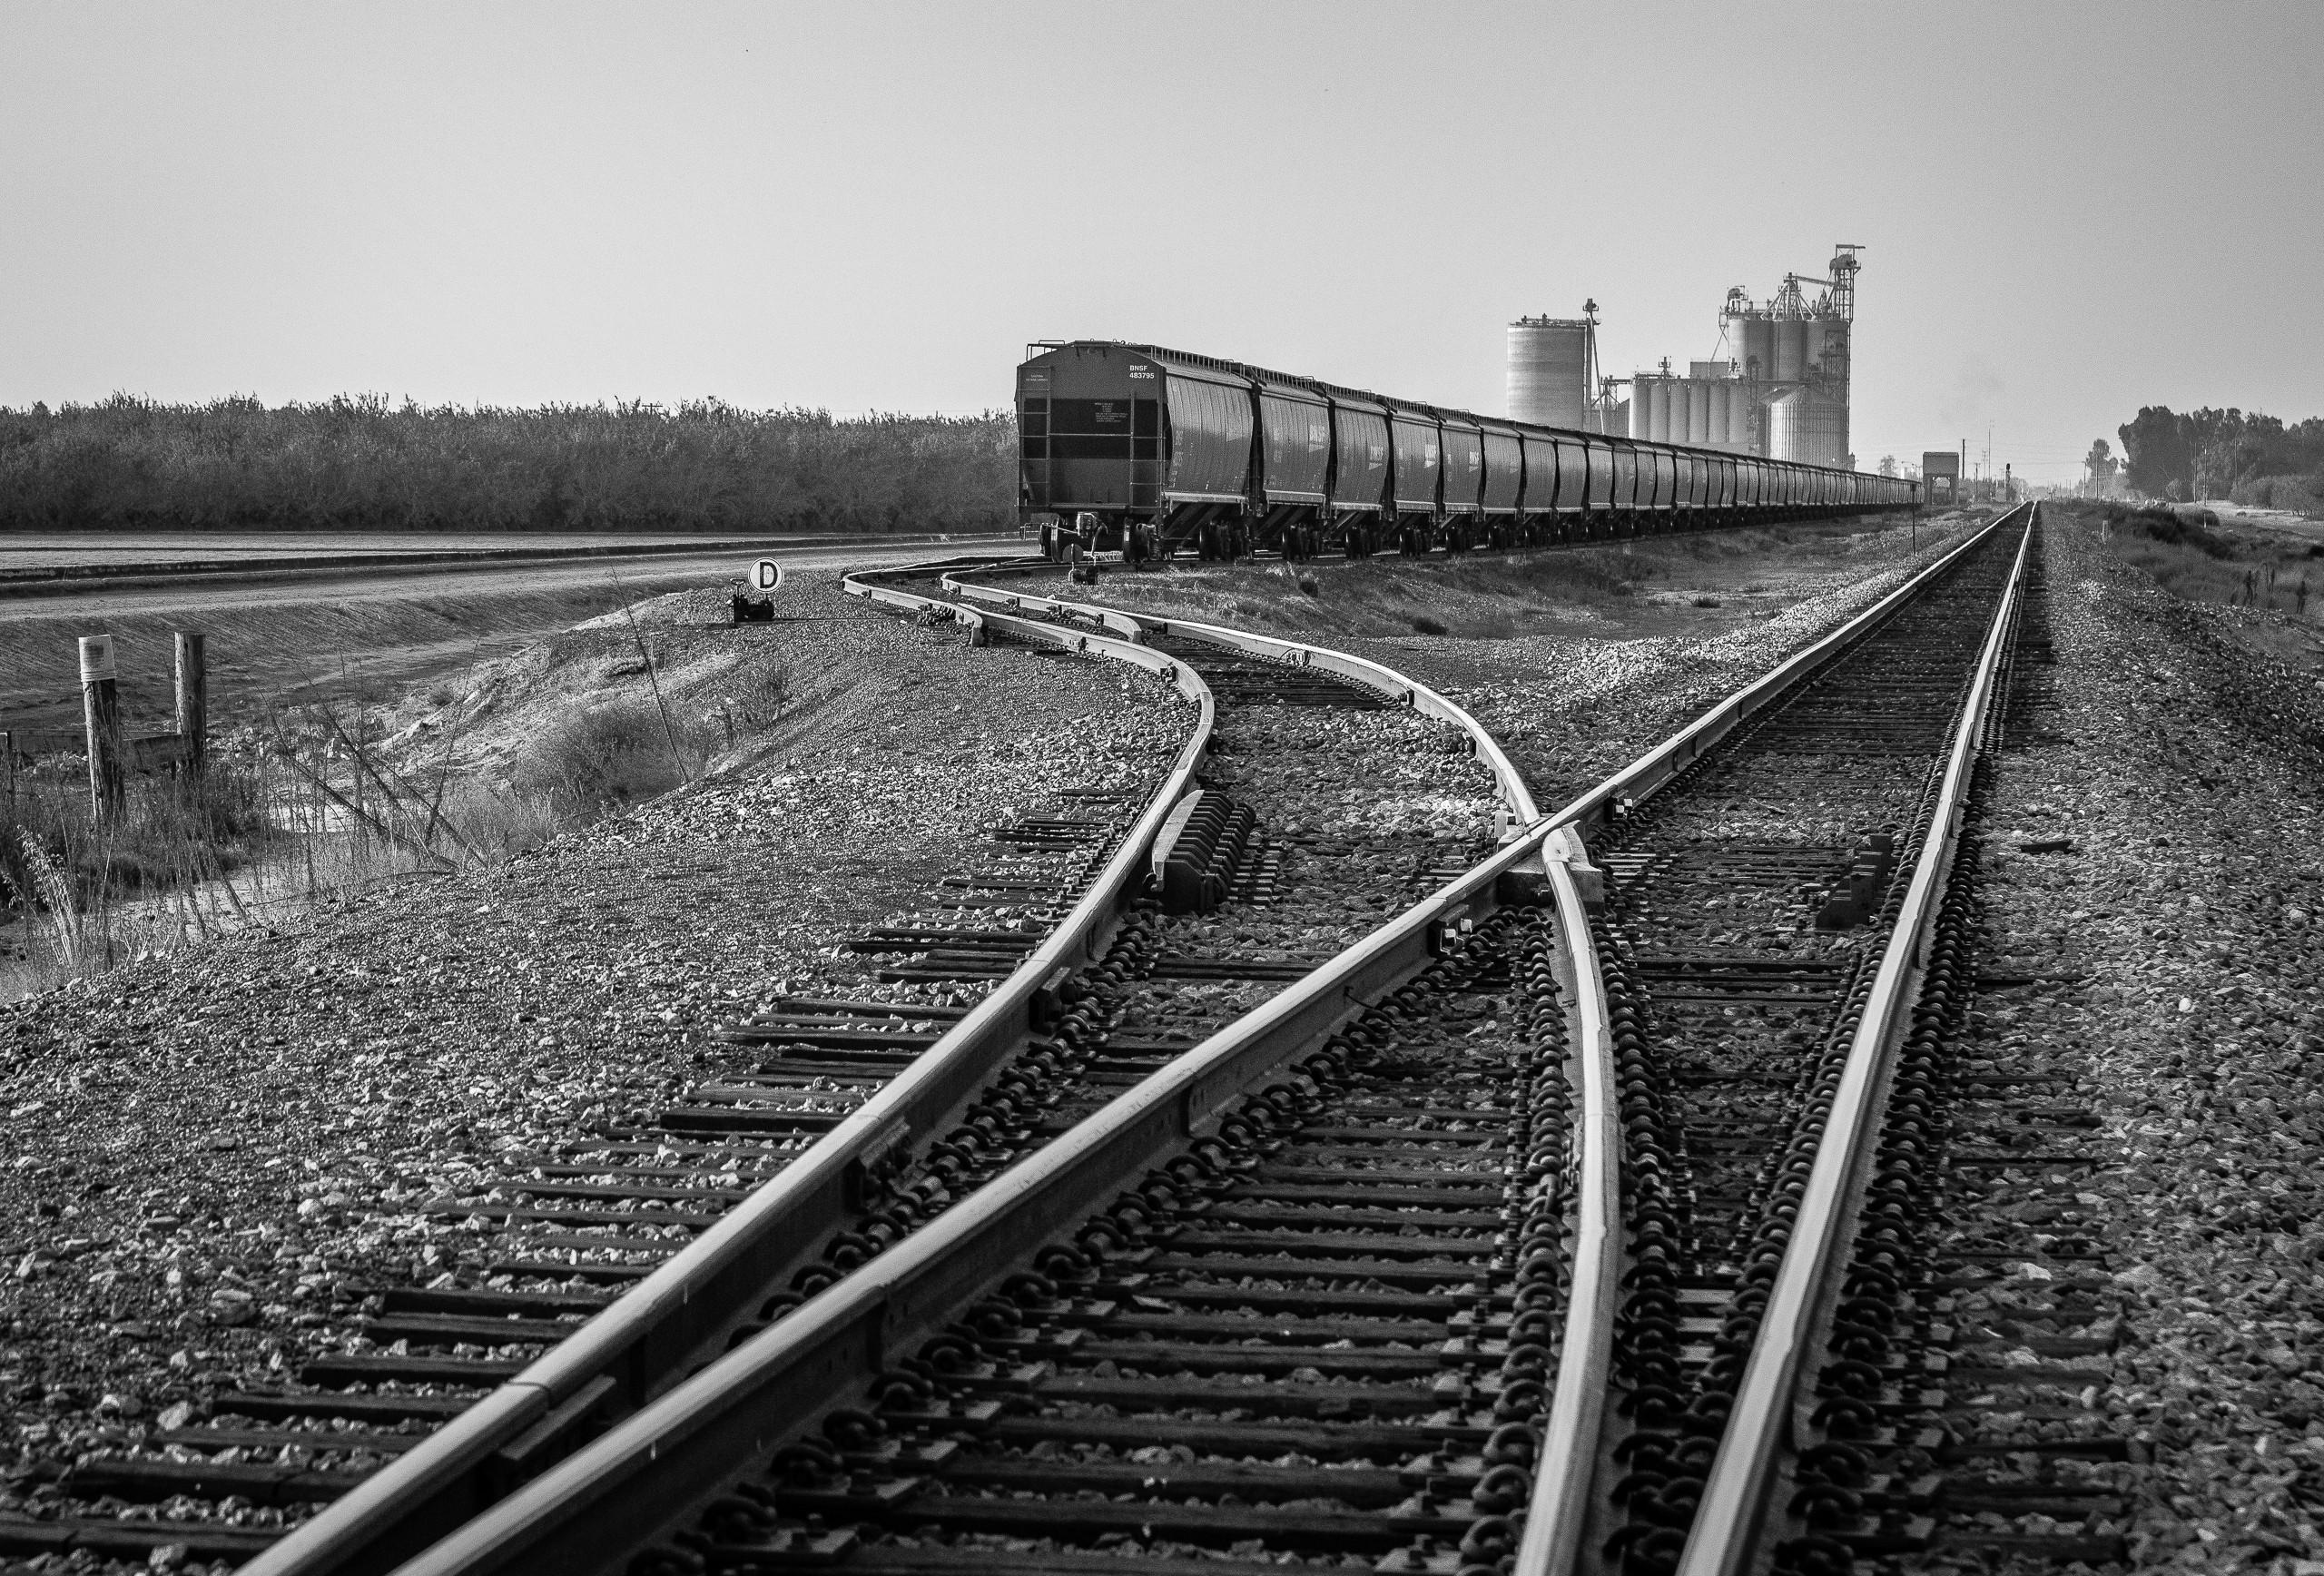 The Grain Train II